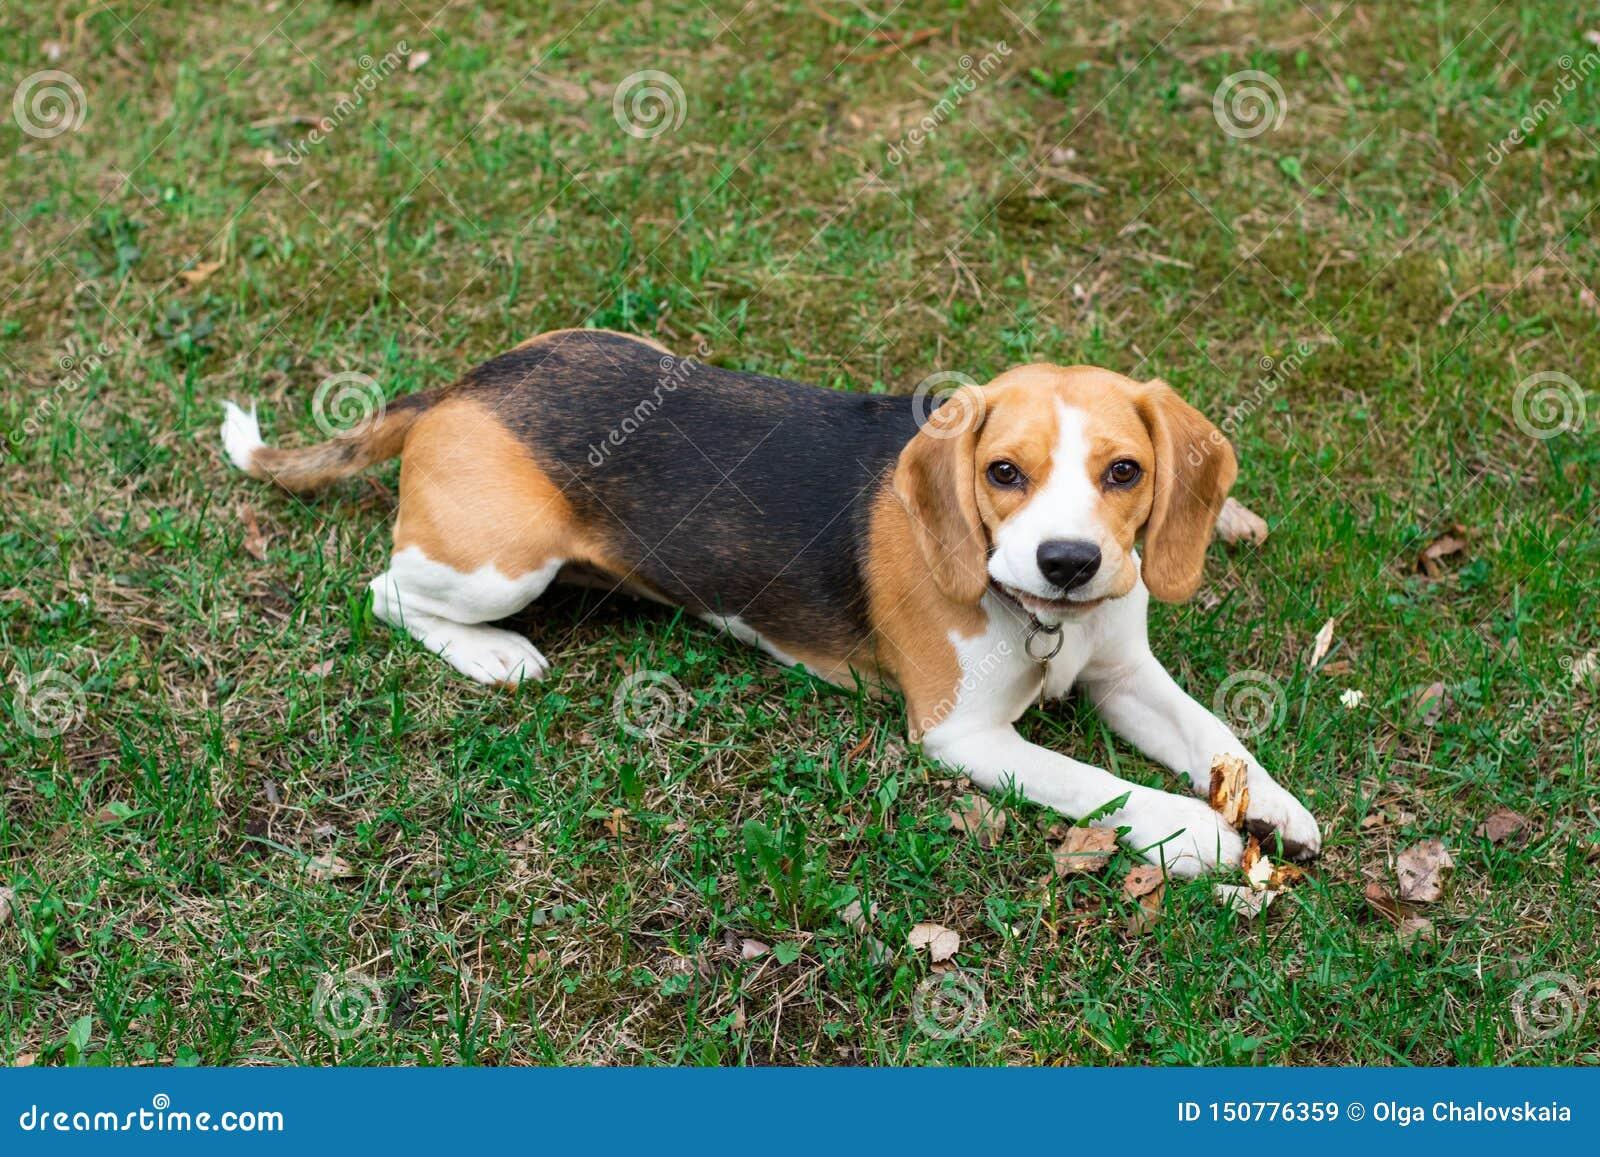 Cute beagle dog lying on green grass, Portrait cute Beagle dog